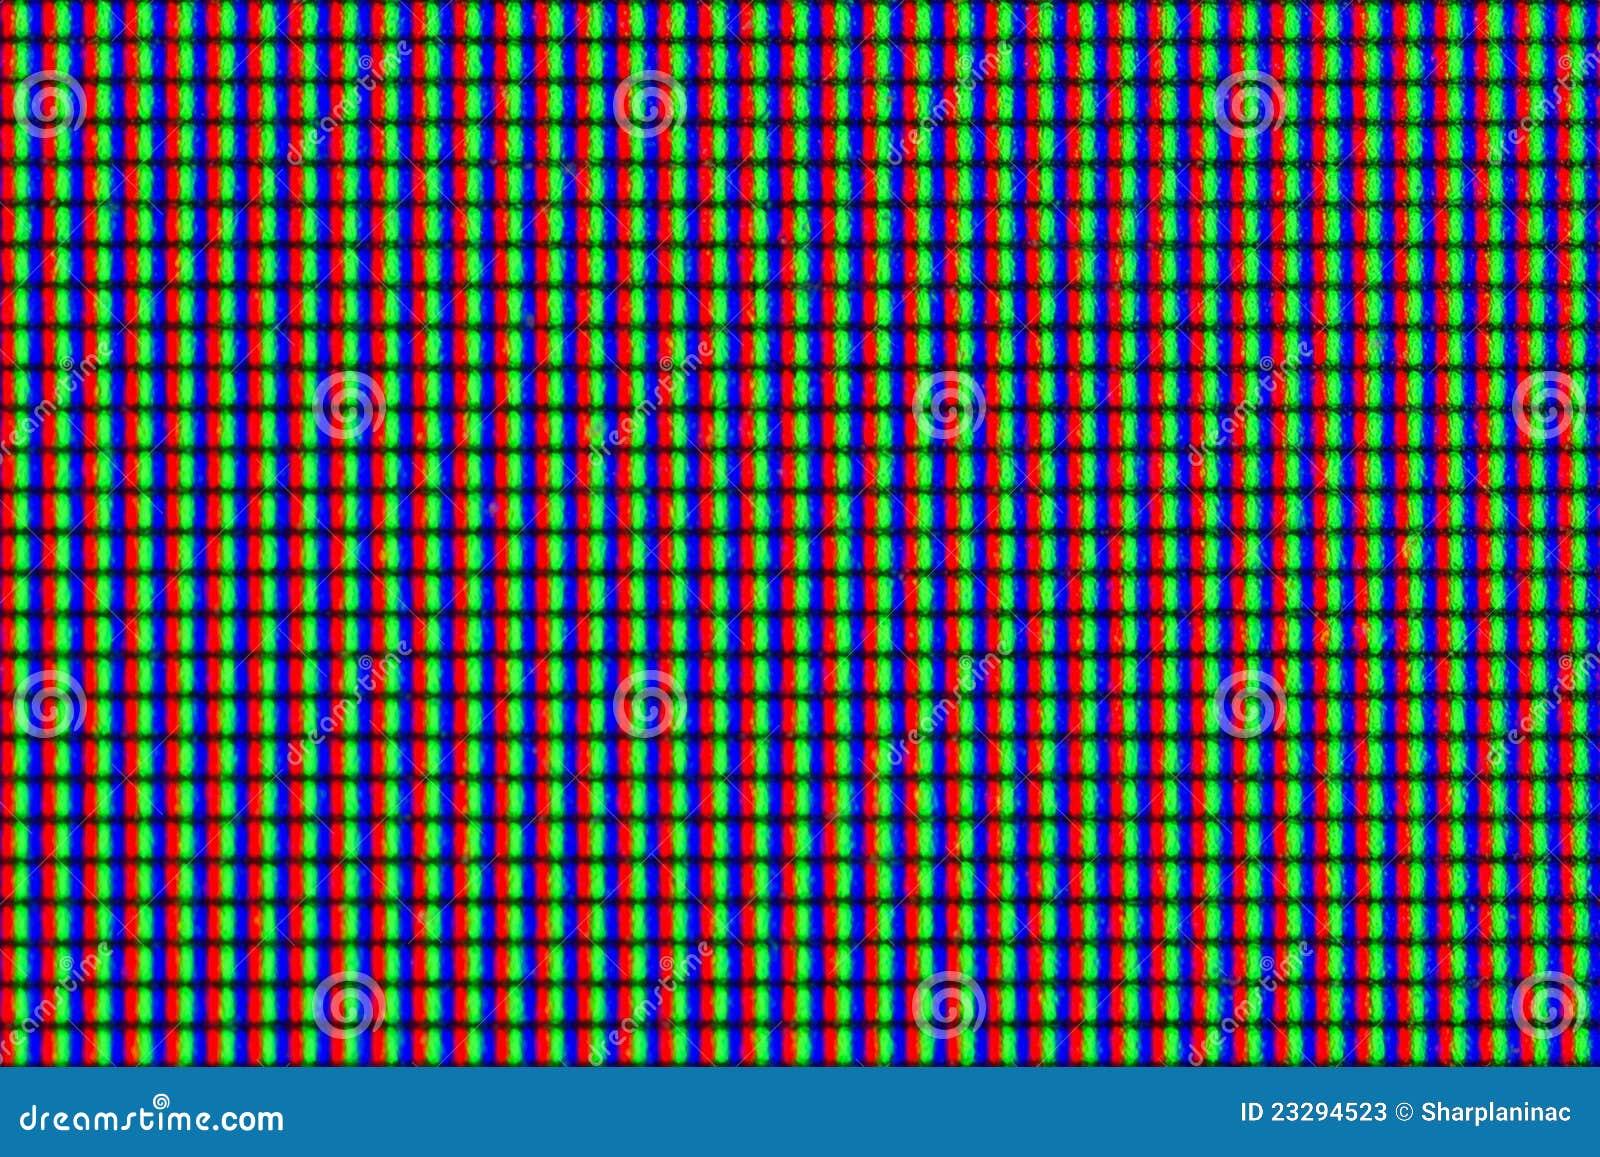 Seamless LCD Screen Pixels Stock Photos - Image: 23294523